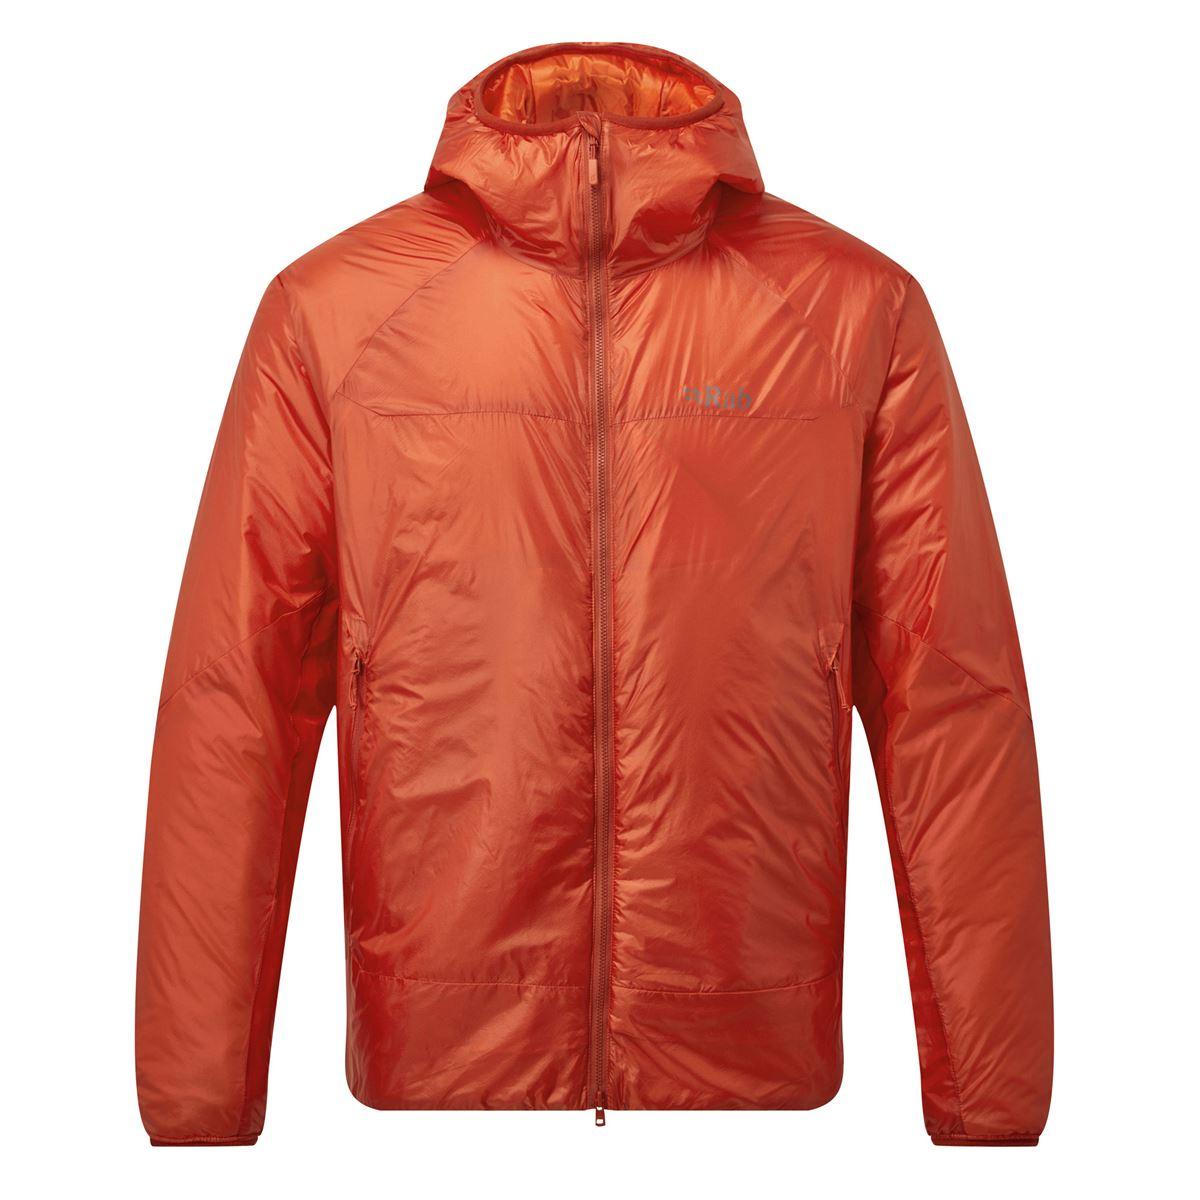 Rab Men S Xenon Jacket Needle Sports Ltd